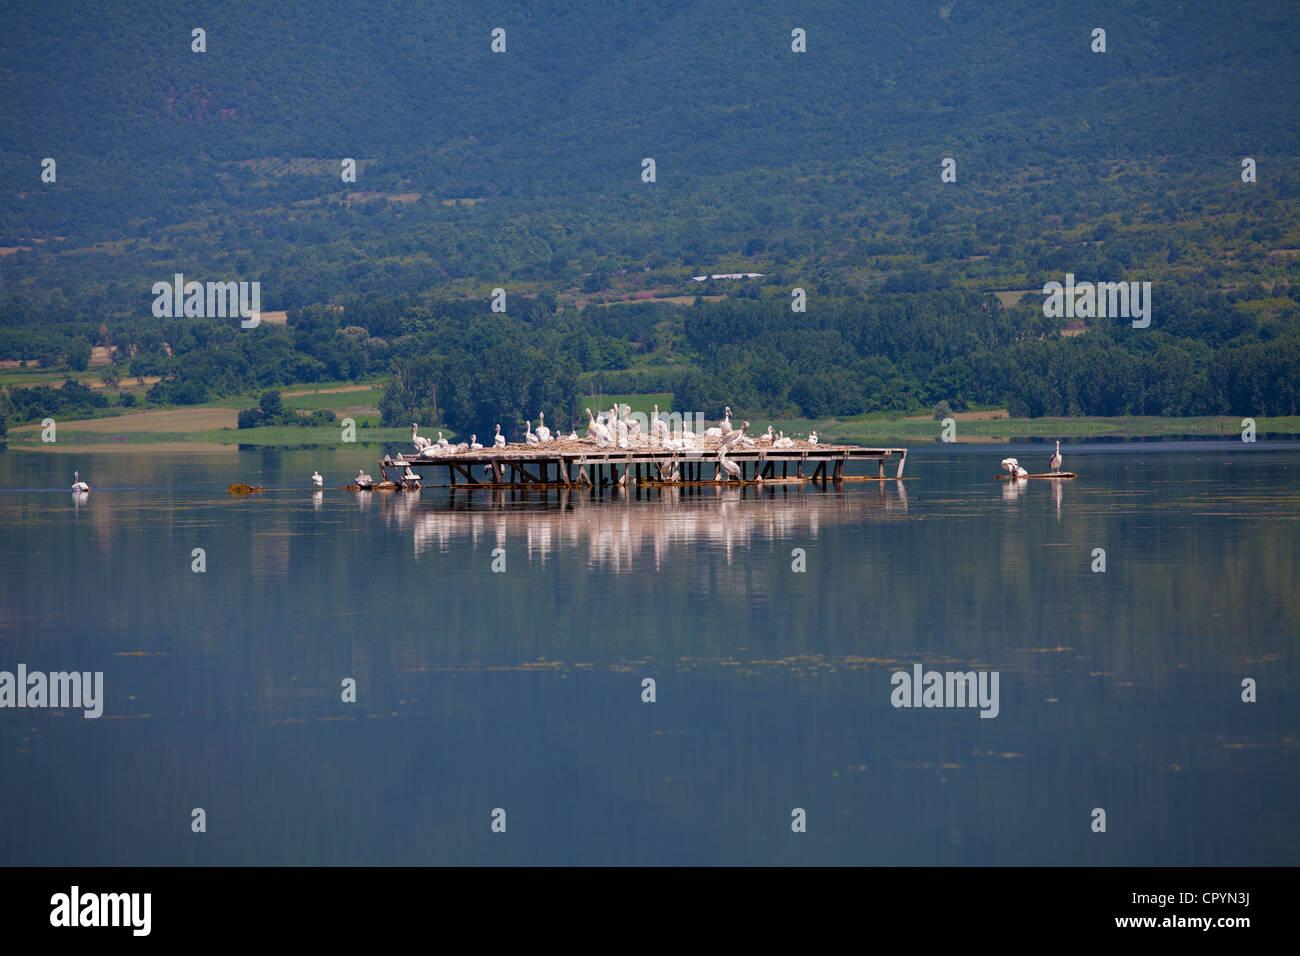 pelecans community,kerkini lake,Greece - Stock Image